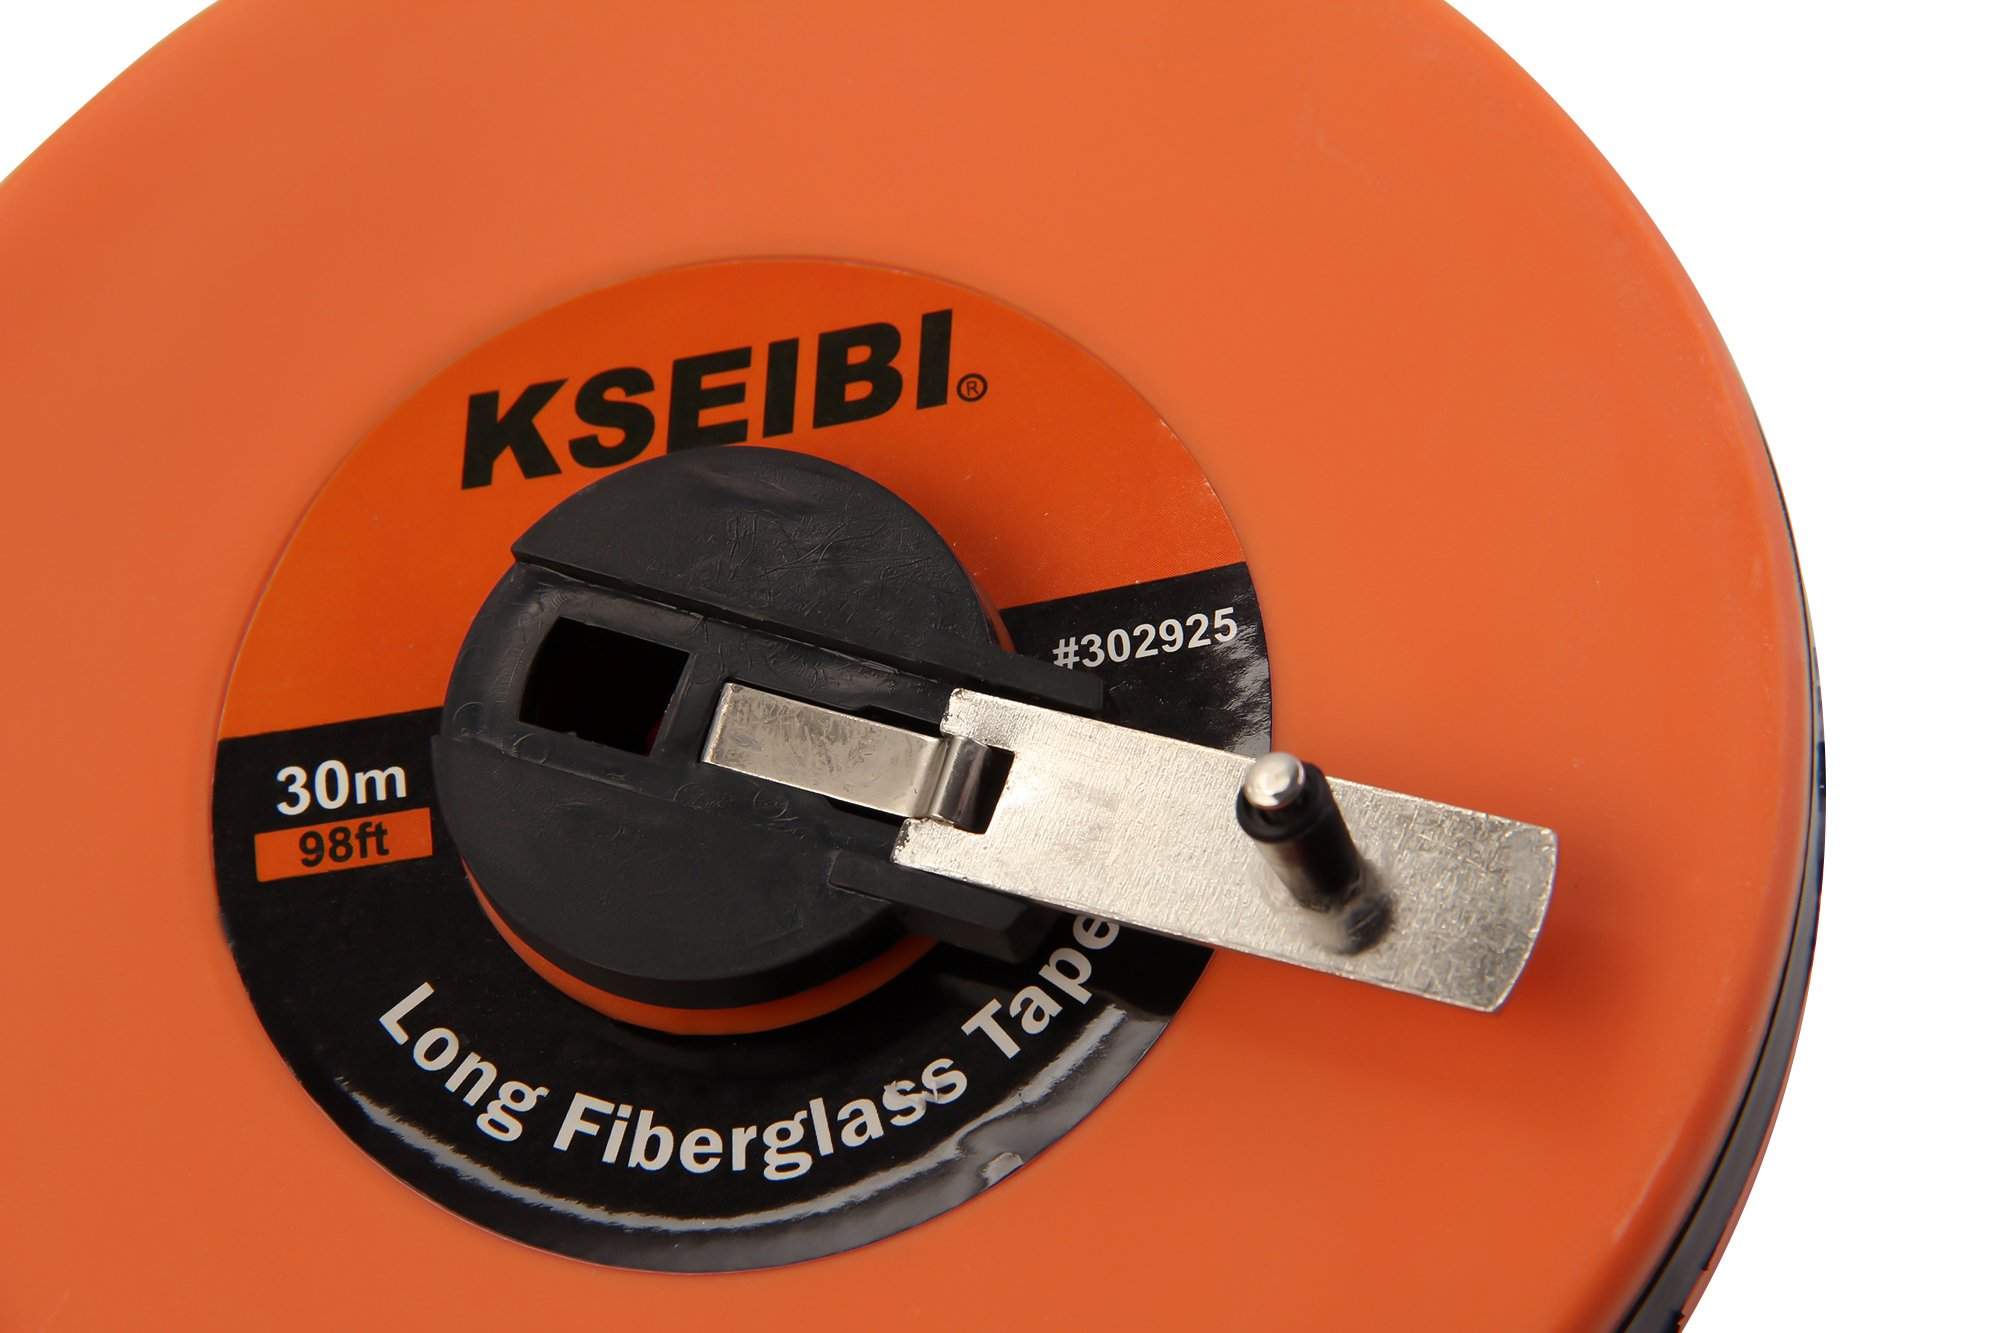 KSEIBI 302940 Long Fiberglass Tape Measure Double Face Printing Inch/Metric for Construction Work (150ft/50m) by KSEIBI (Image #2)